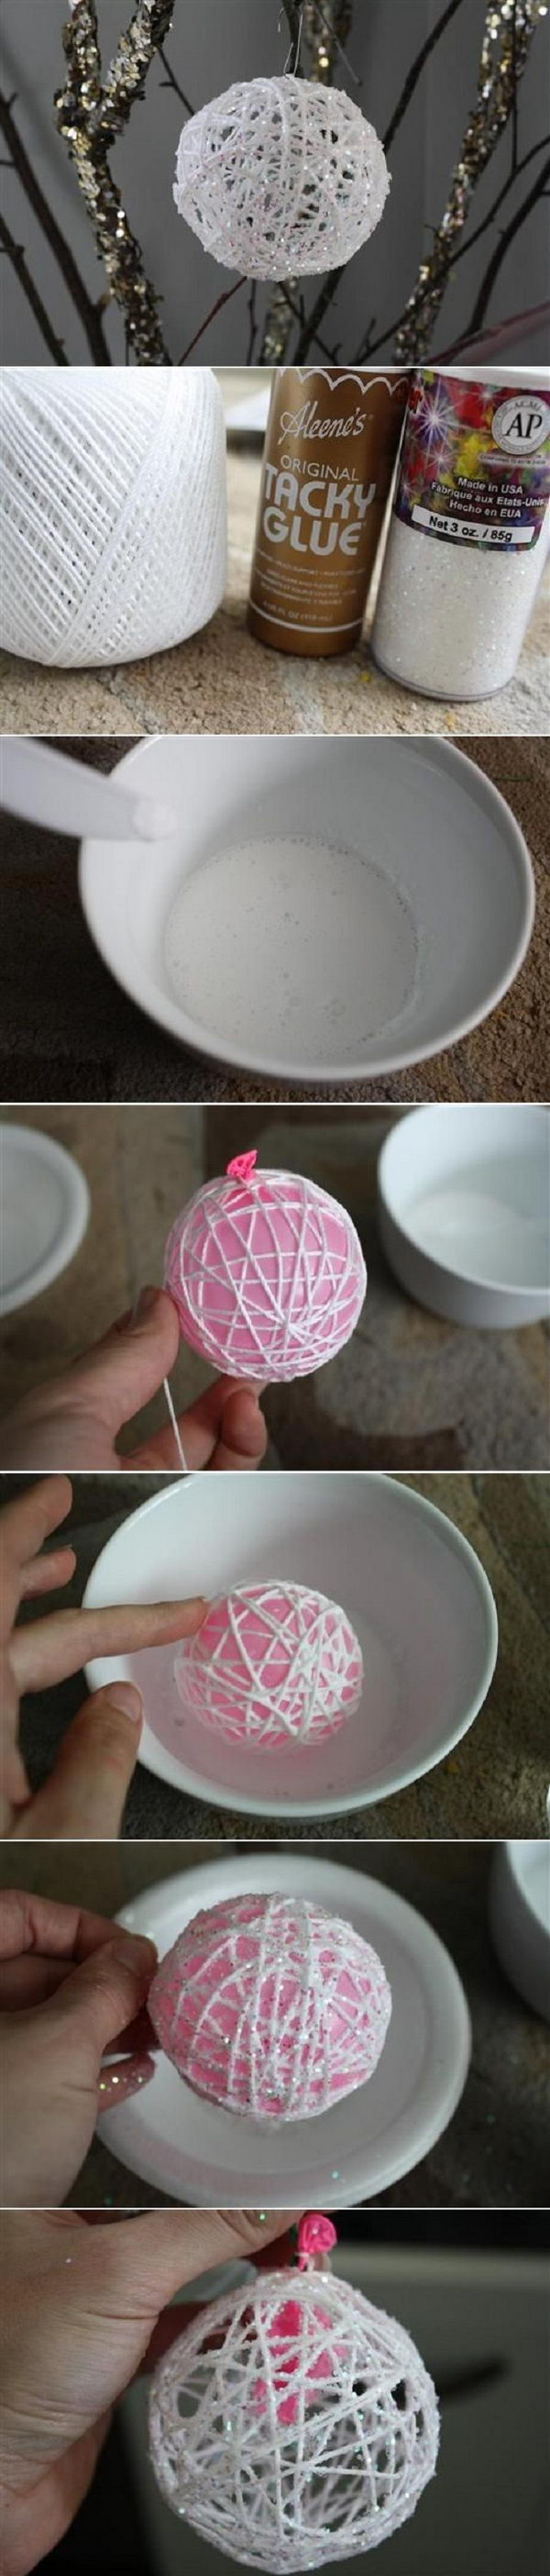 DIY Glittery Snowball Ornaments.